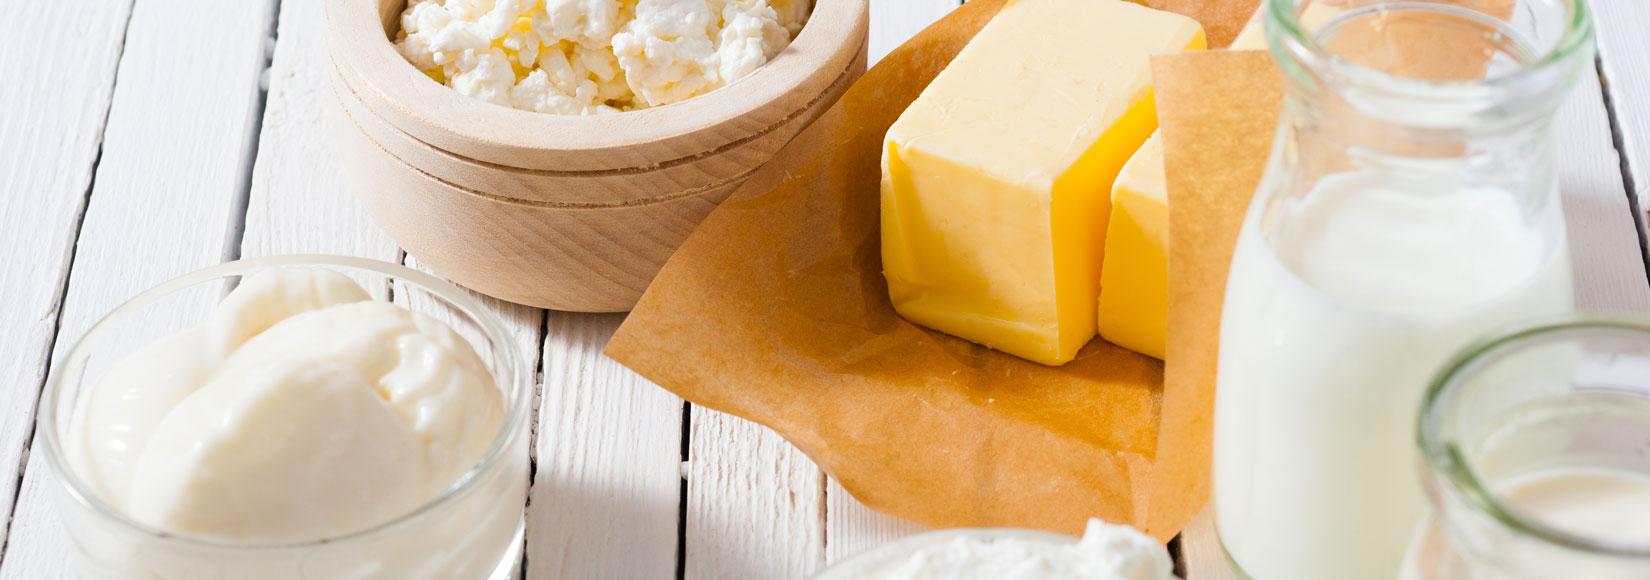 Dairy Sampling Solutions